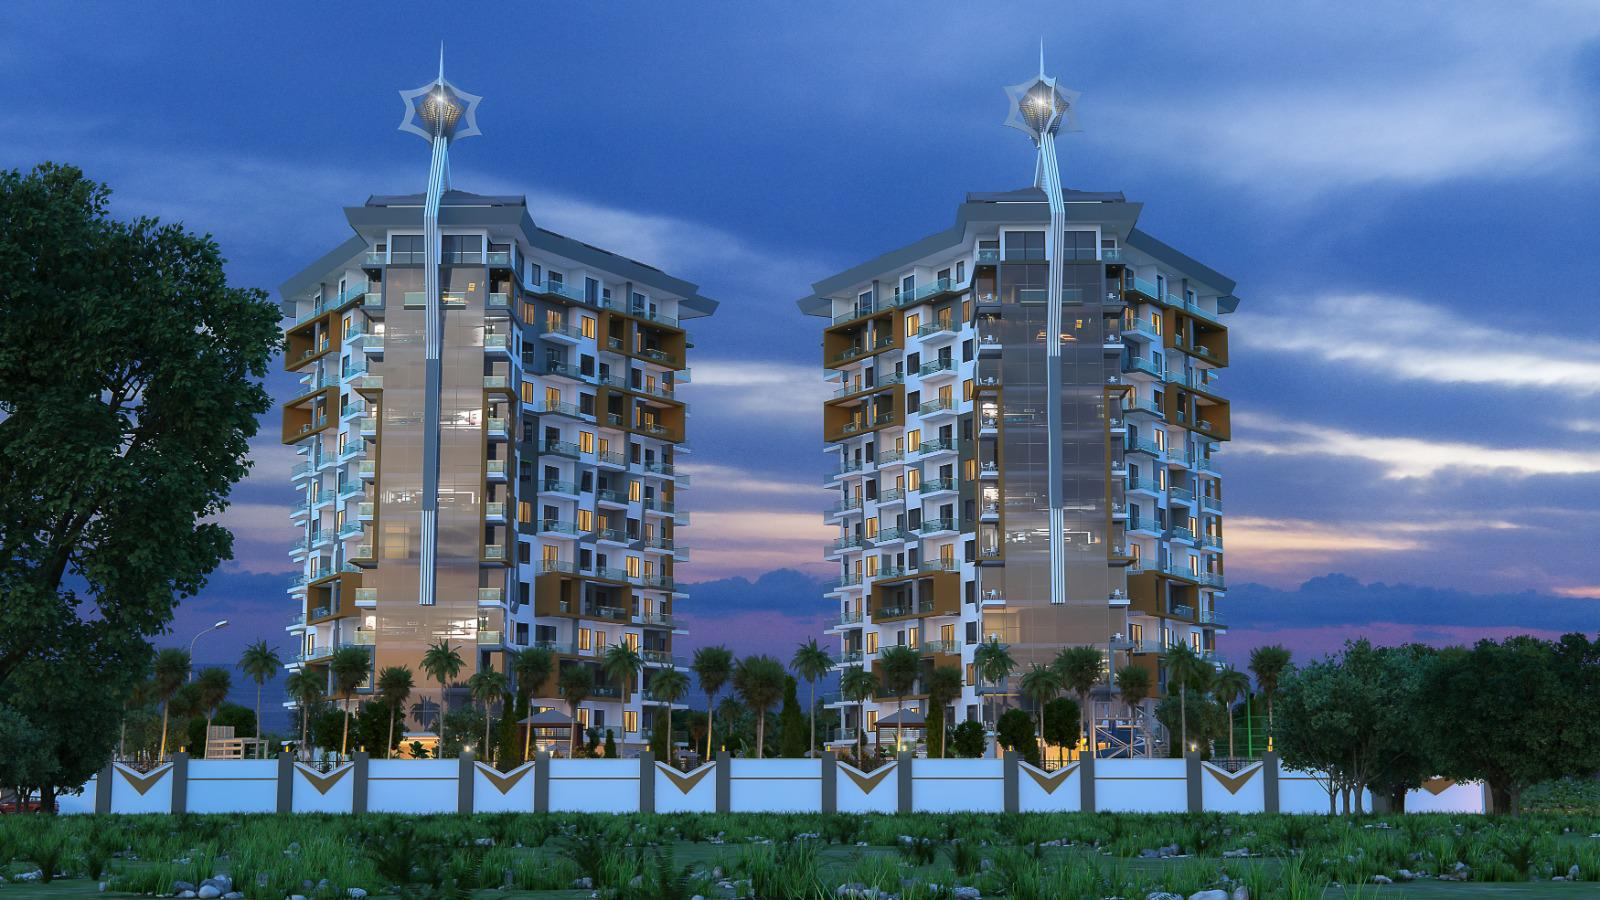 Квартиры и пентхаусы в комплексе с богатой инфраструктурой район Махмутлар - Фото 2